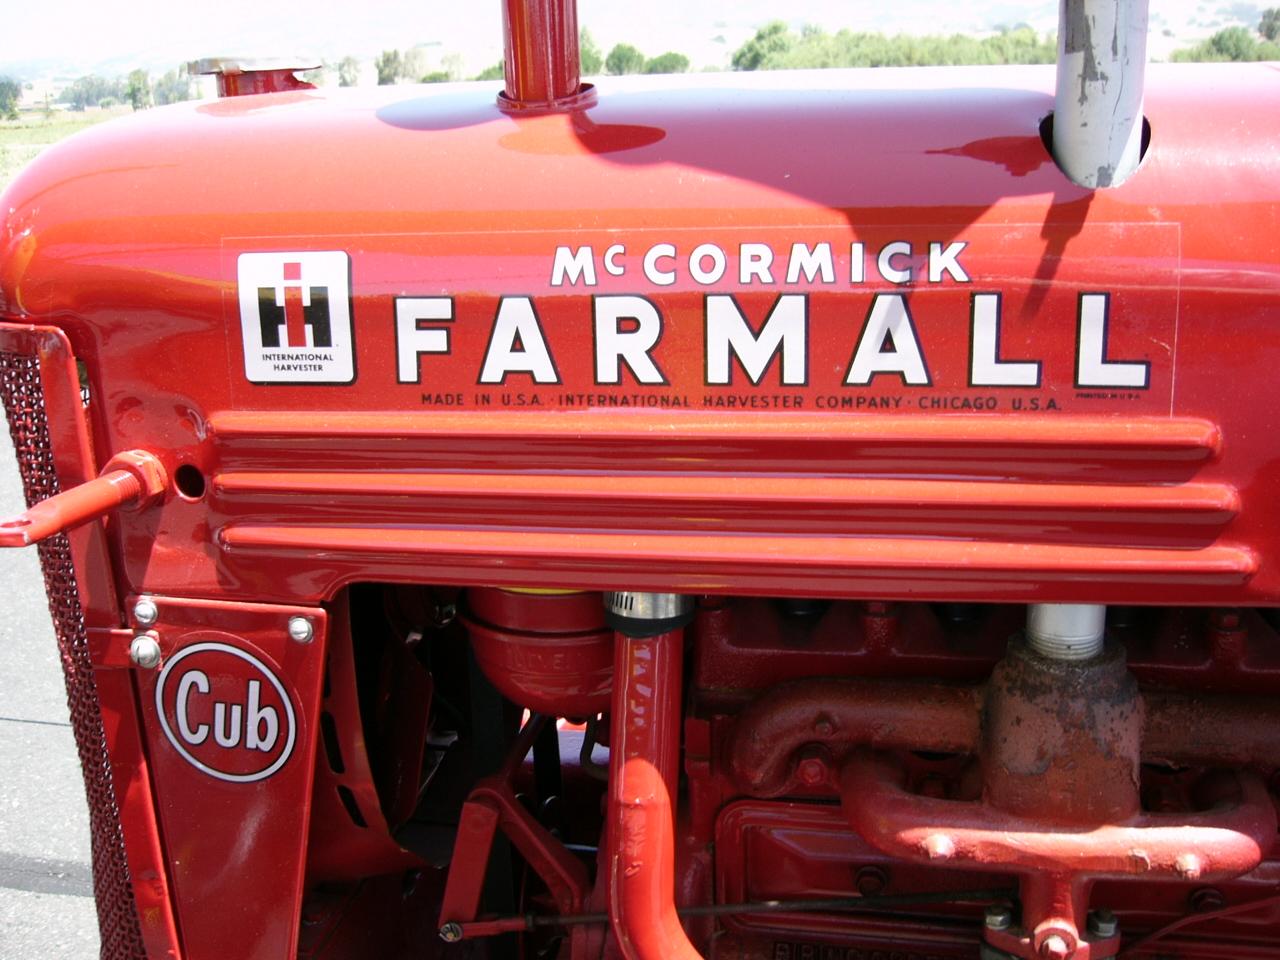 McCormick Farmall Cub tractor by RoadTripDog on DeviantArt